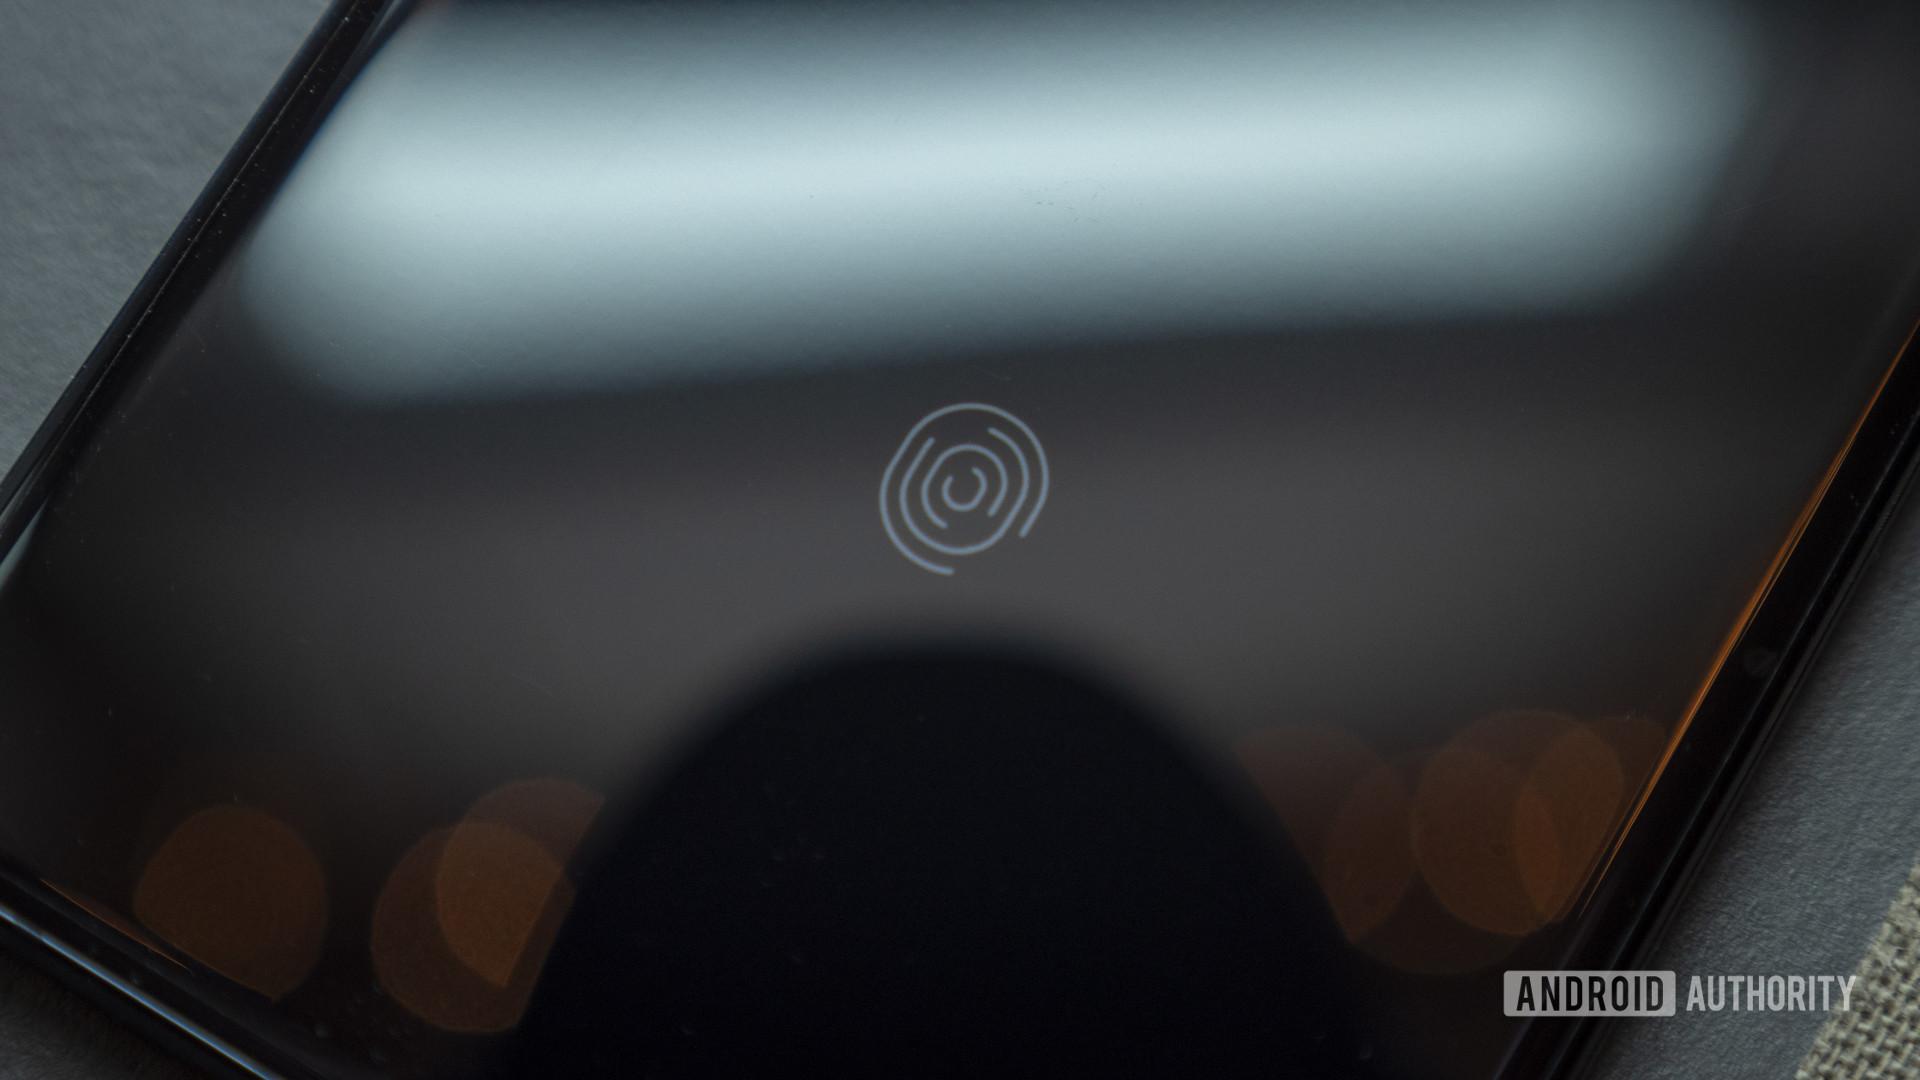 samsung galaxy s20 plus review in display fingerprint sensor